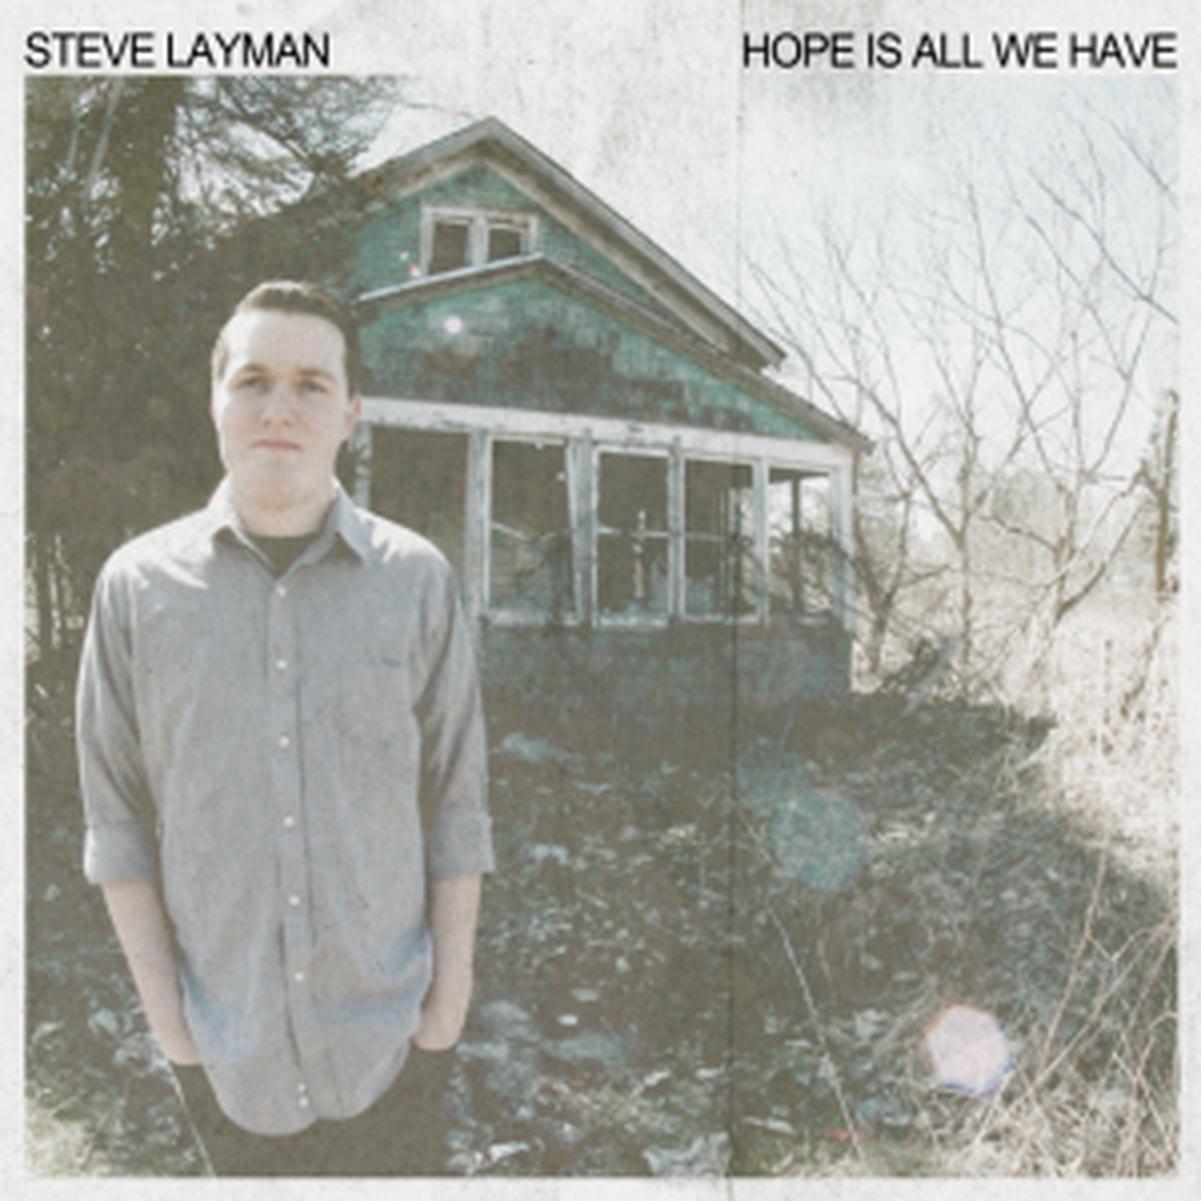 Steve Layman